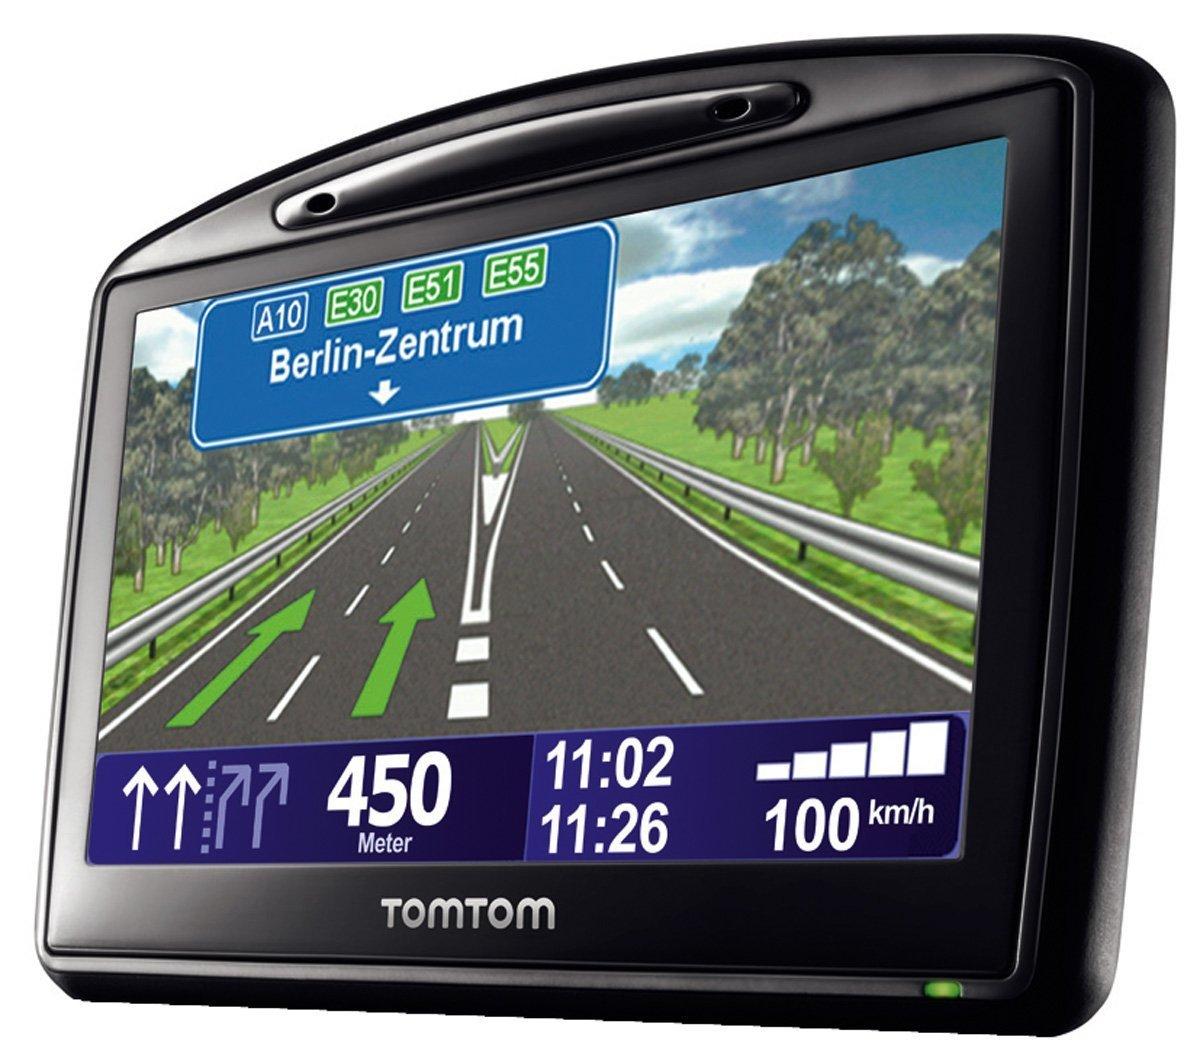 TomTom Go 730 Traffic Navigationssystem inkl. TMC Pro (10,9 cm (4,3 Zoll) Display, 31 Lä nderkarten, Bluetooth, Text-to-Speech, Fahrspurassistent) 1CH7.016.00 Navigationssysteme